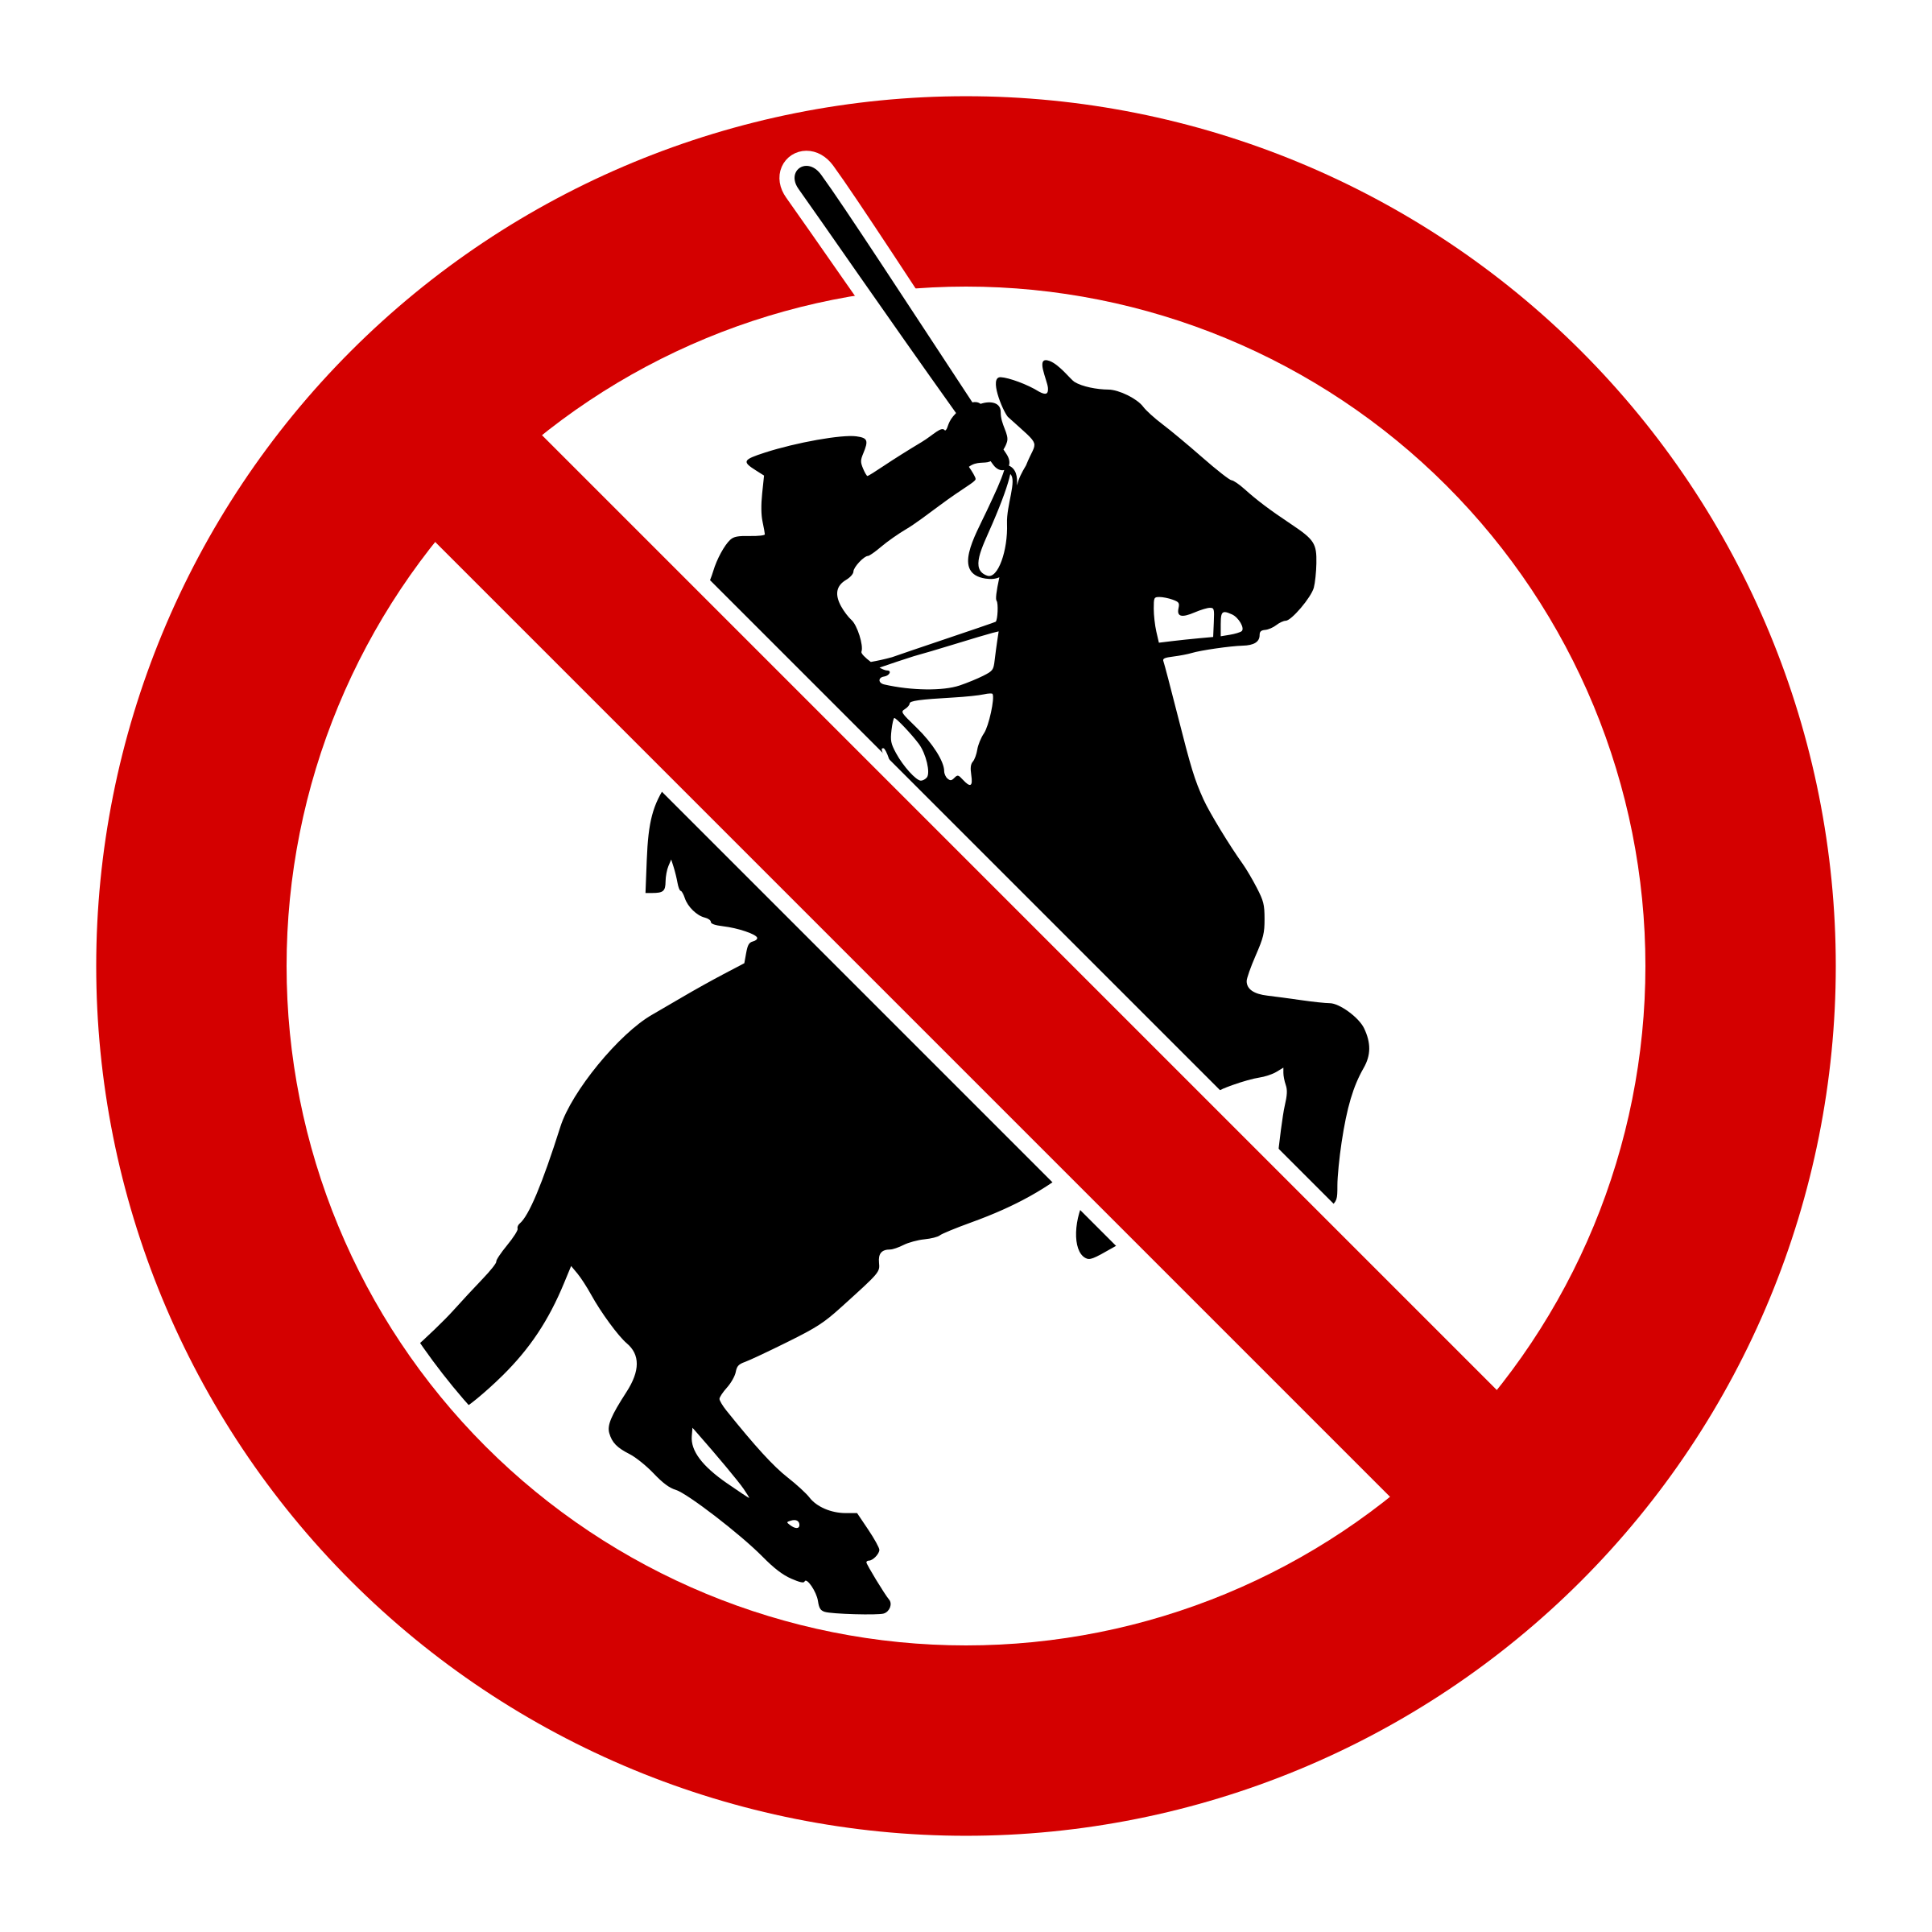 No on horses big. Policeman clipart police baton